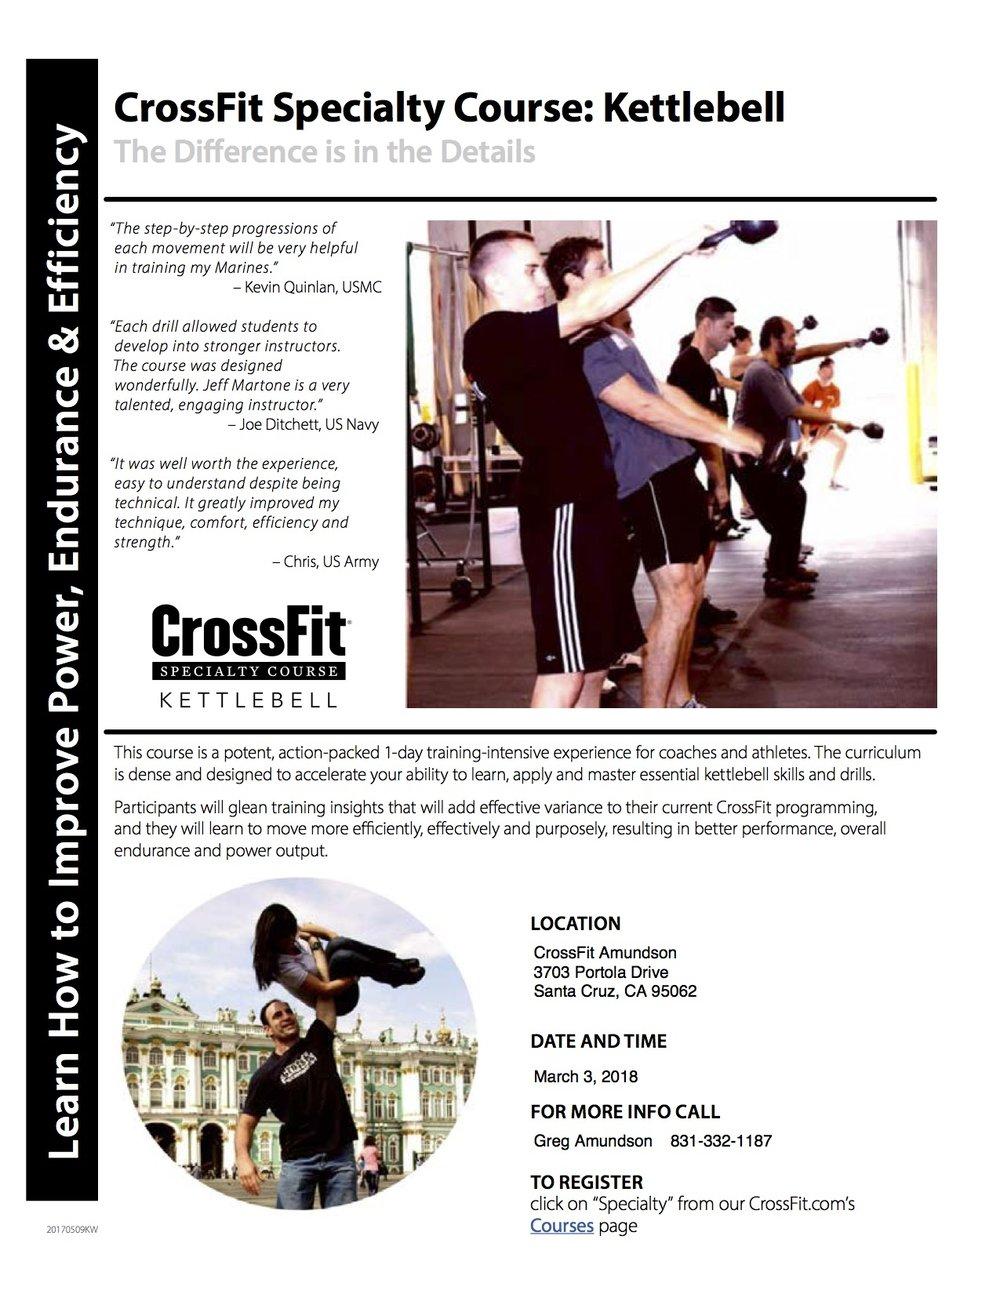 CrossFit+Kettlebell+1-Day+Course+Flyer+-+Santa+Cruz+2018.jpg